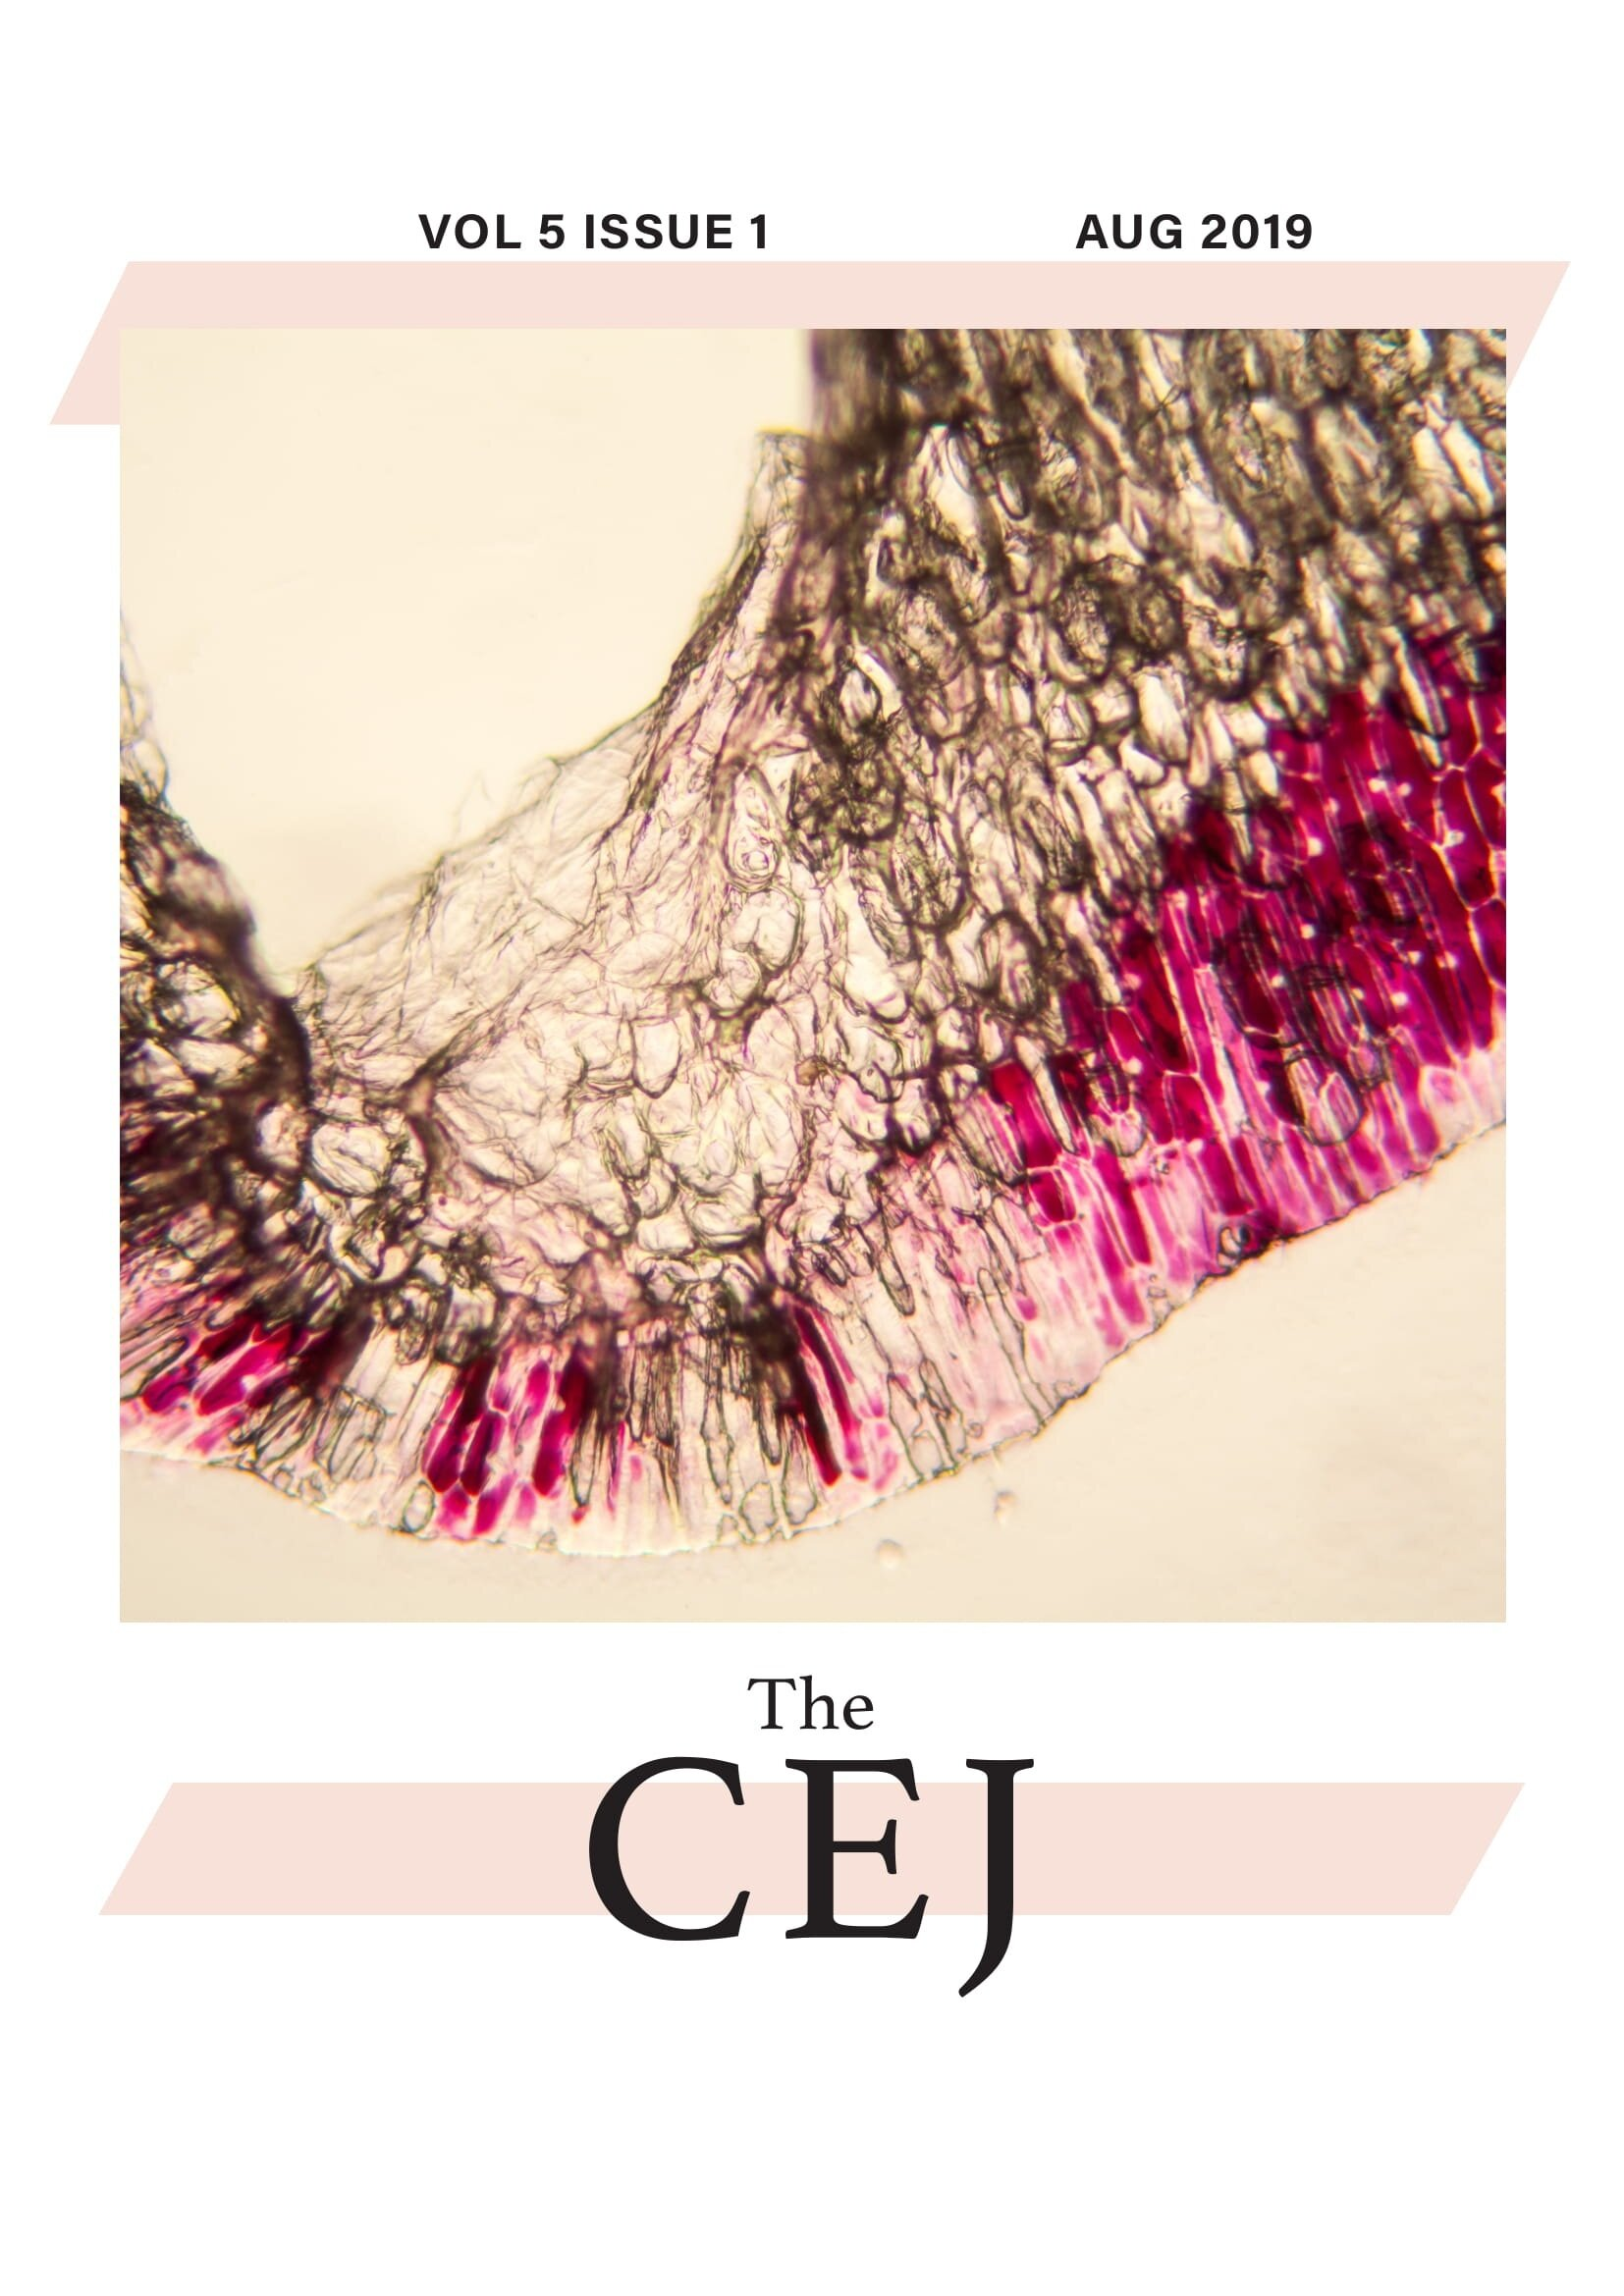 The CEJ (Vol 5 issue 1)